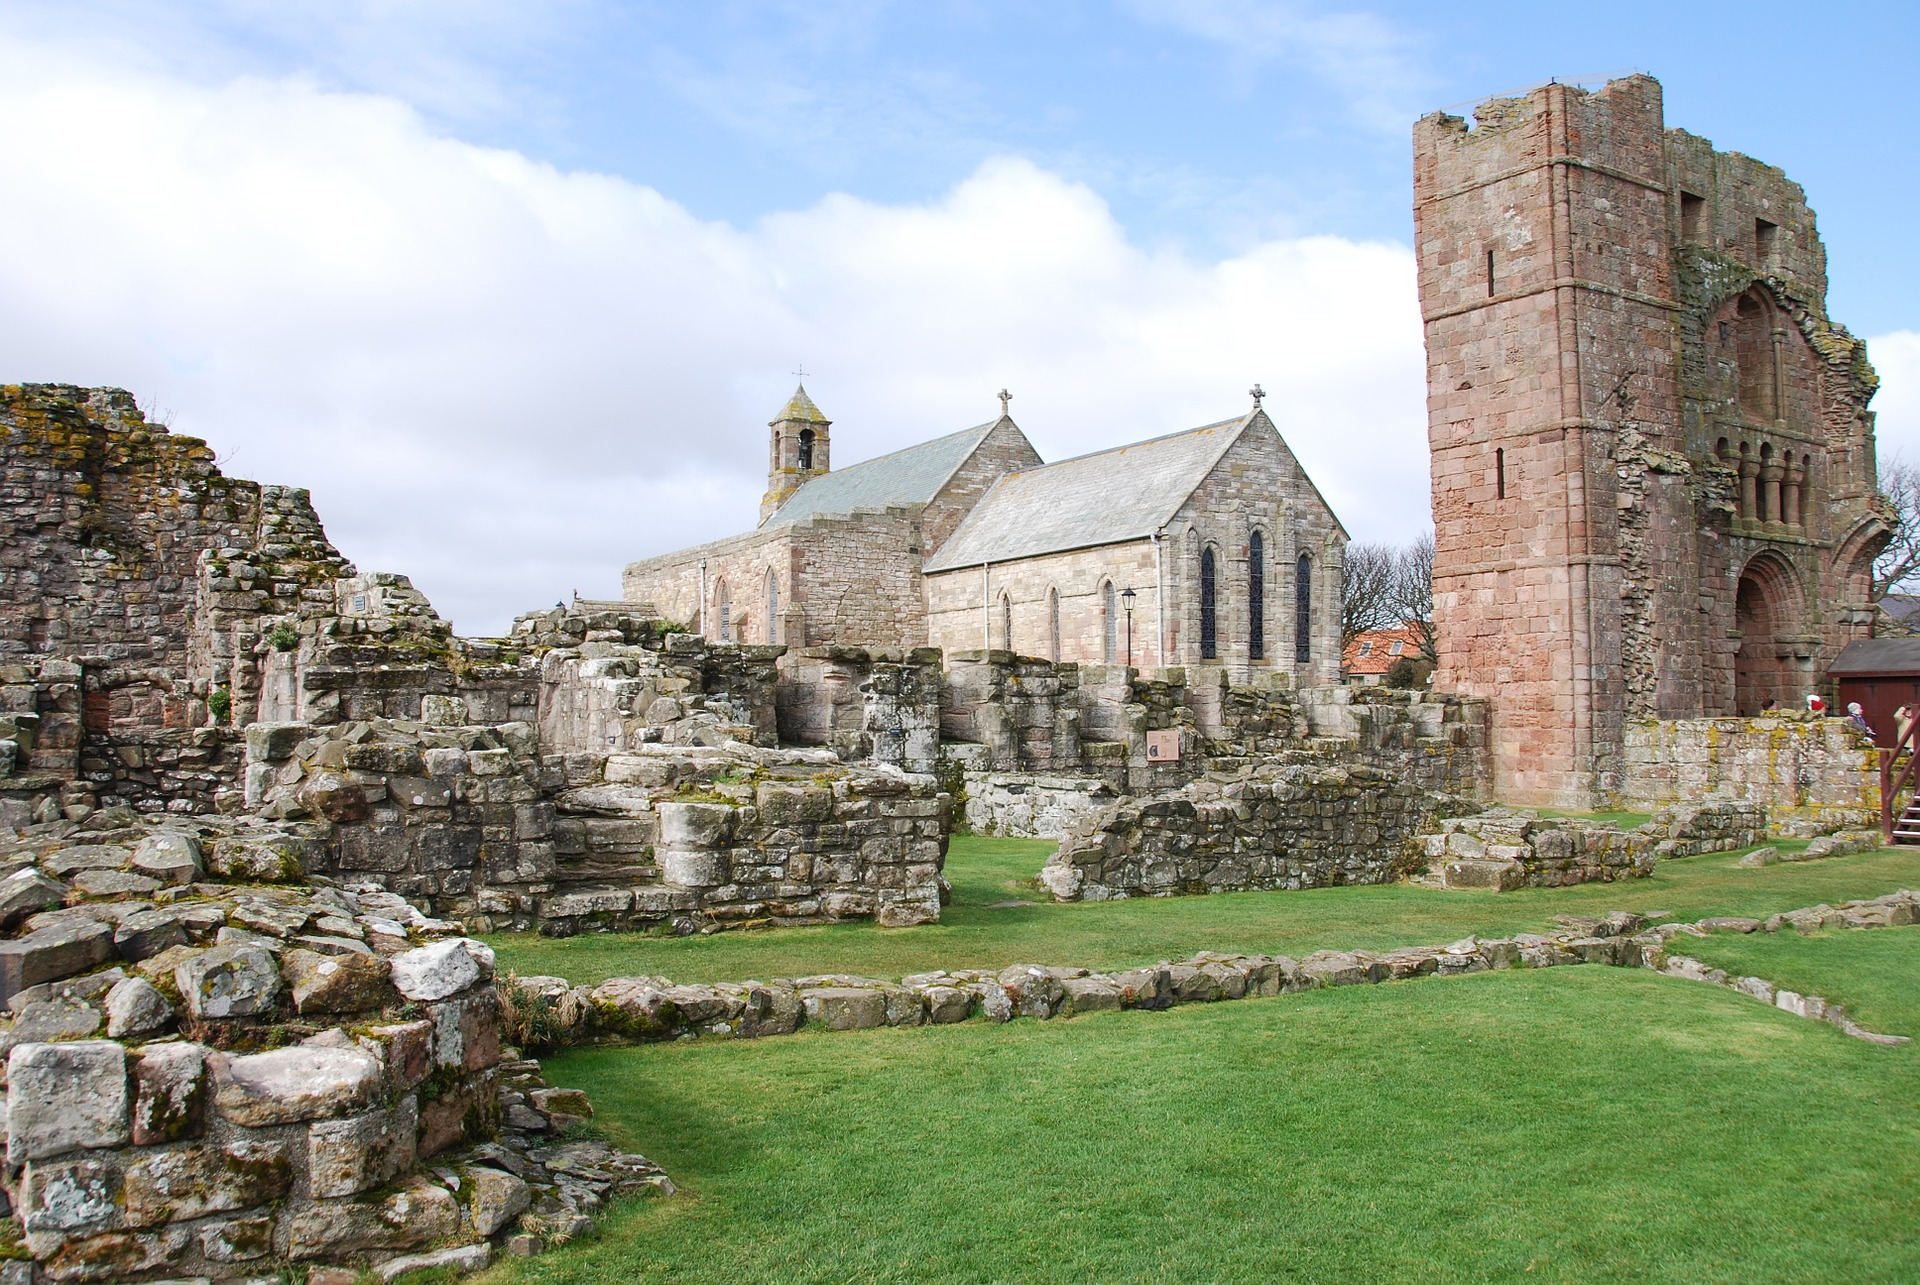 Lindisfarne Priory © yorkshireman | pixabay.com